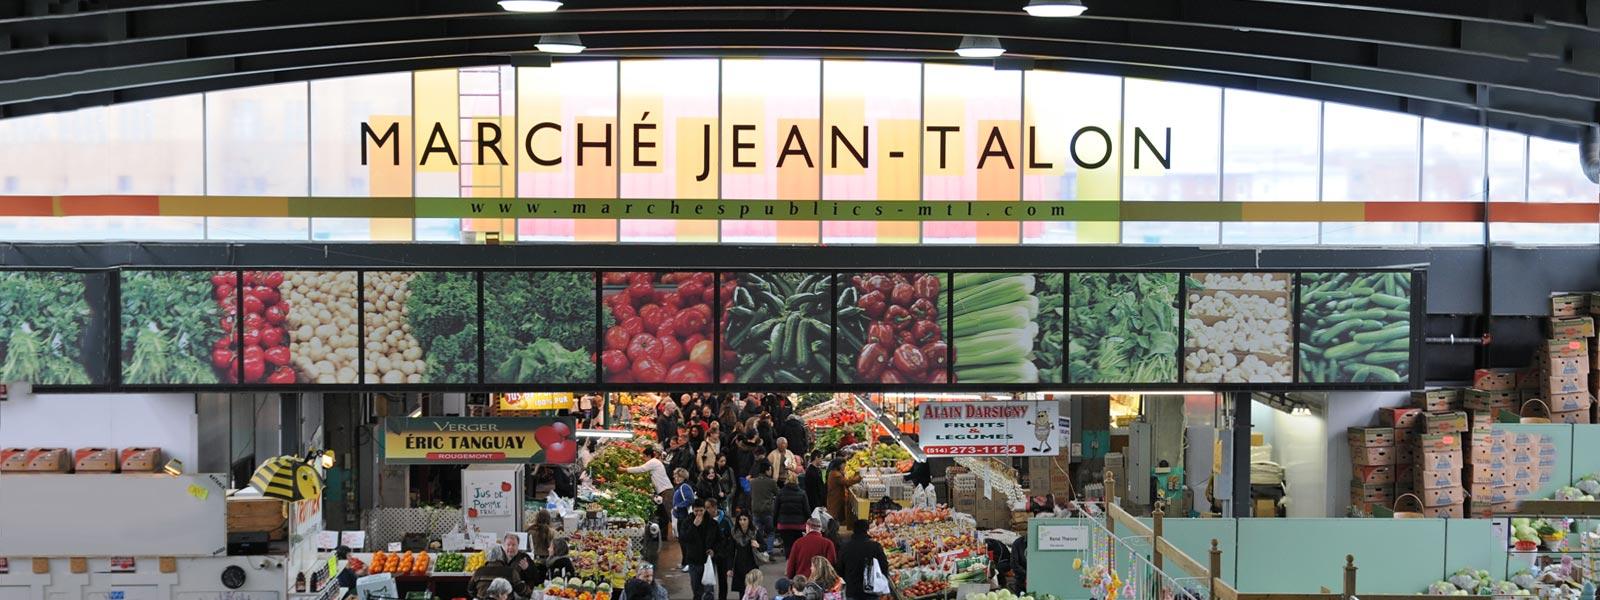 Jean Talon Market Montreal S Public Markets